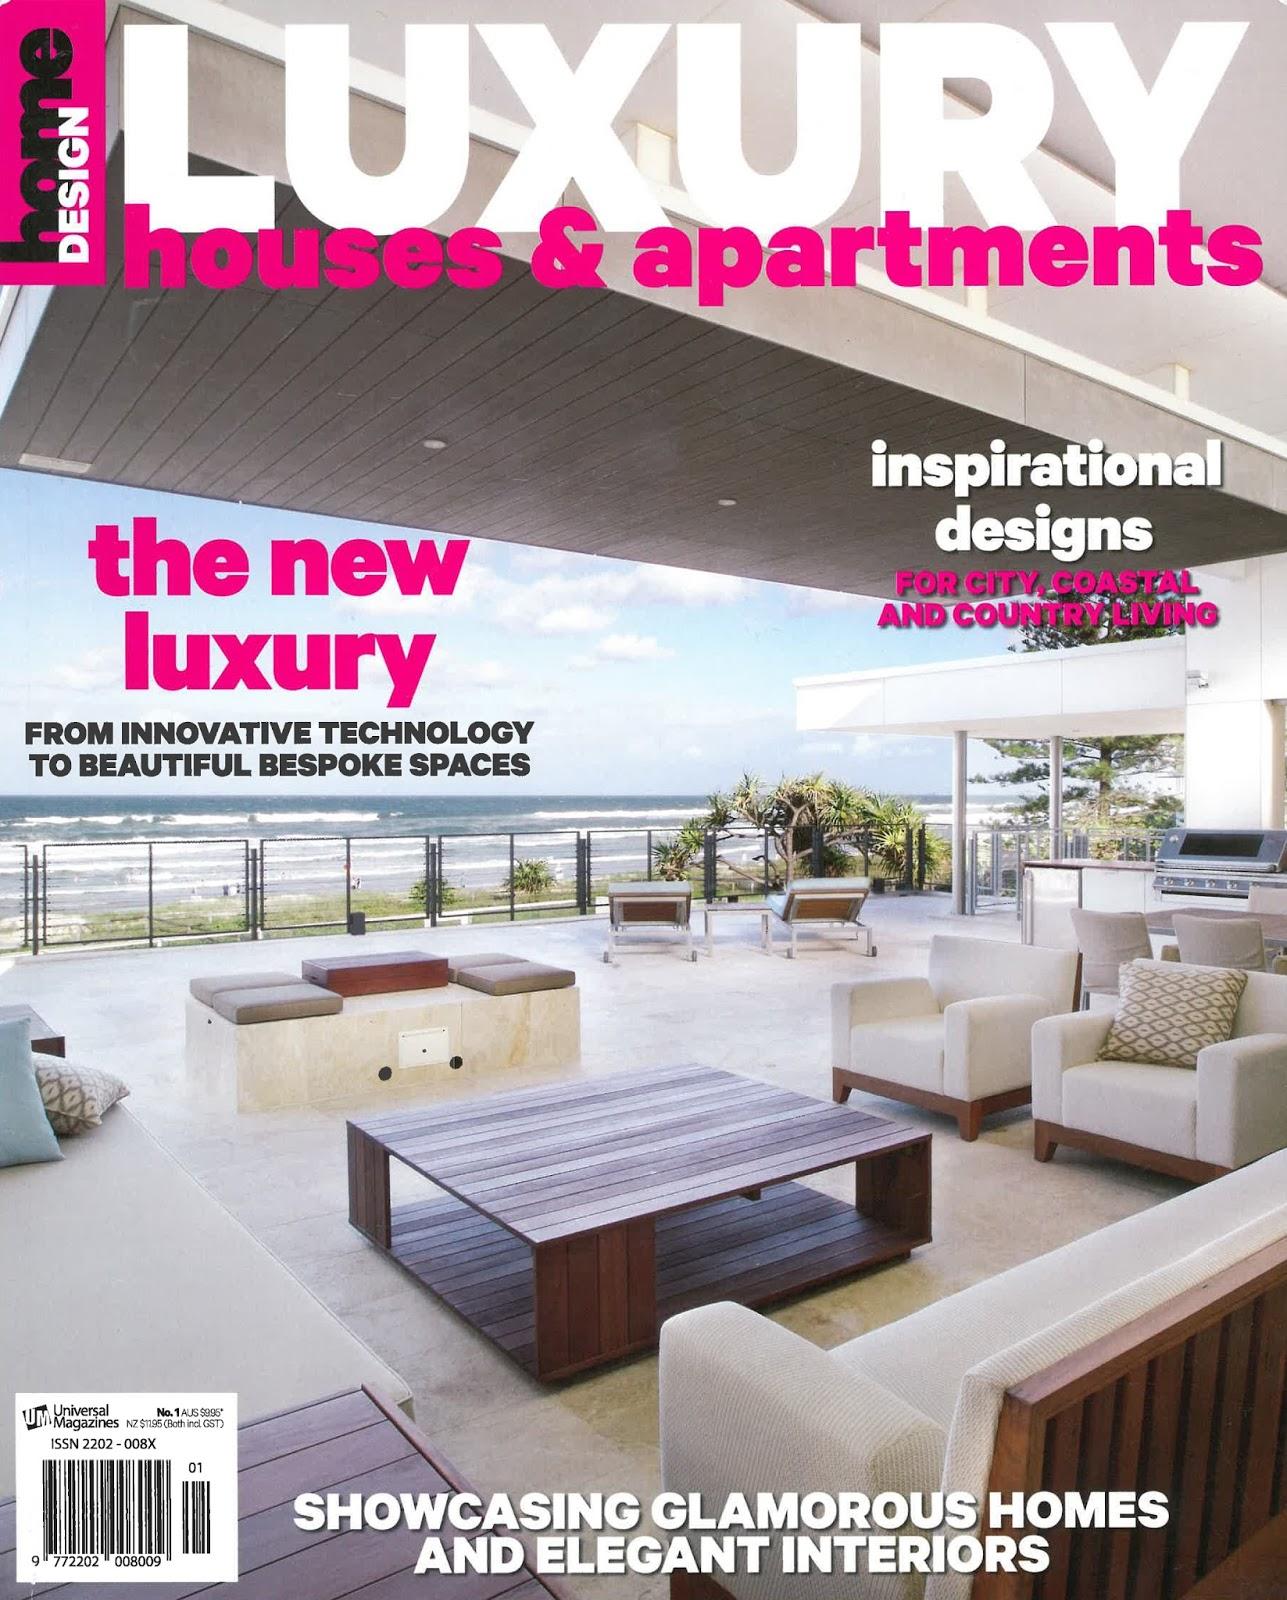 Executive House Apartments: Wrightson Stewart: Wrightson Stewart Makes It Into The